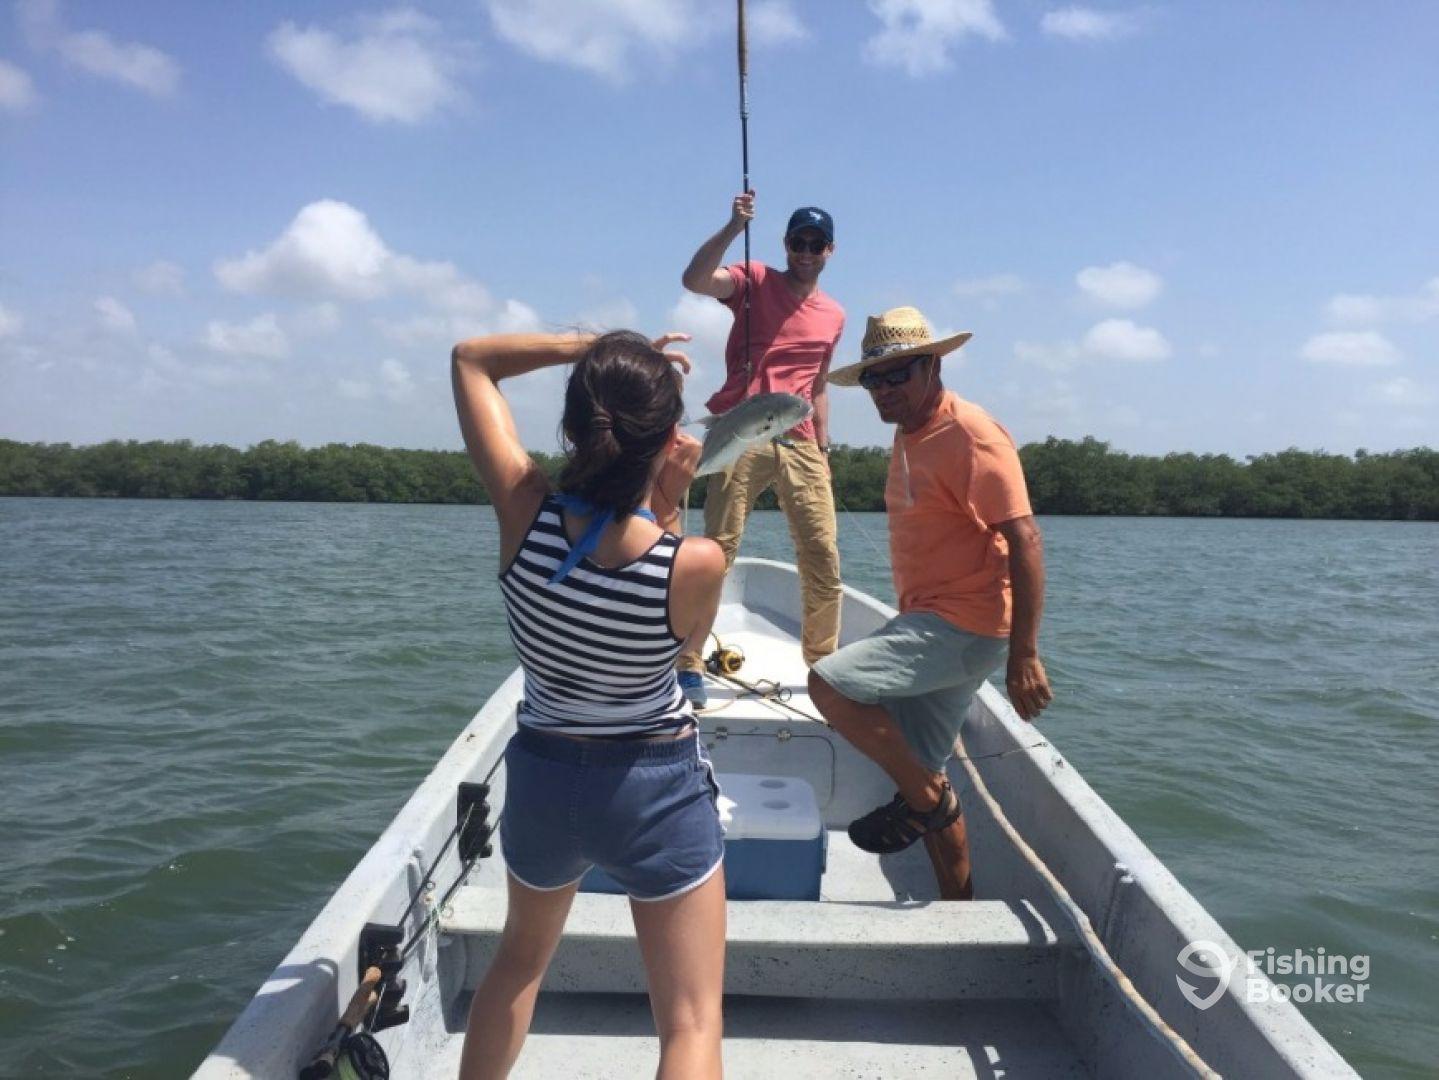 Waata daag fishing adventures placencia belize for Belize fishing charters